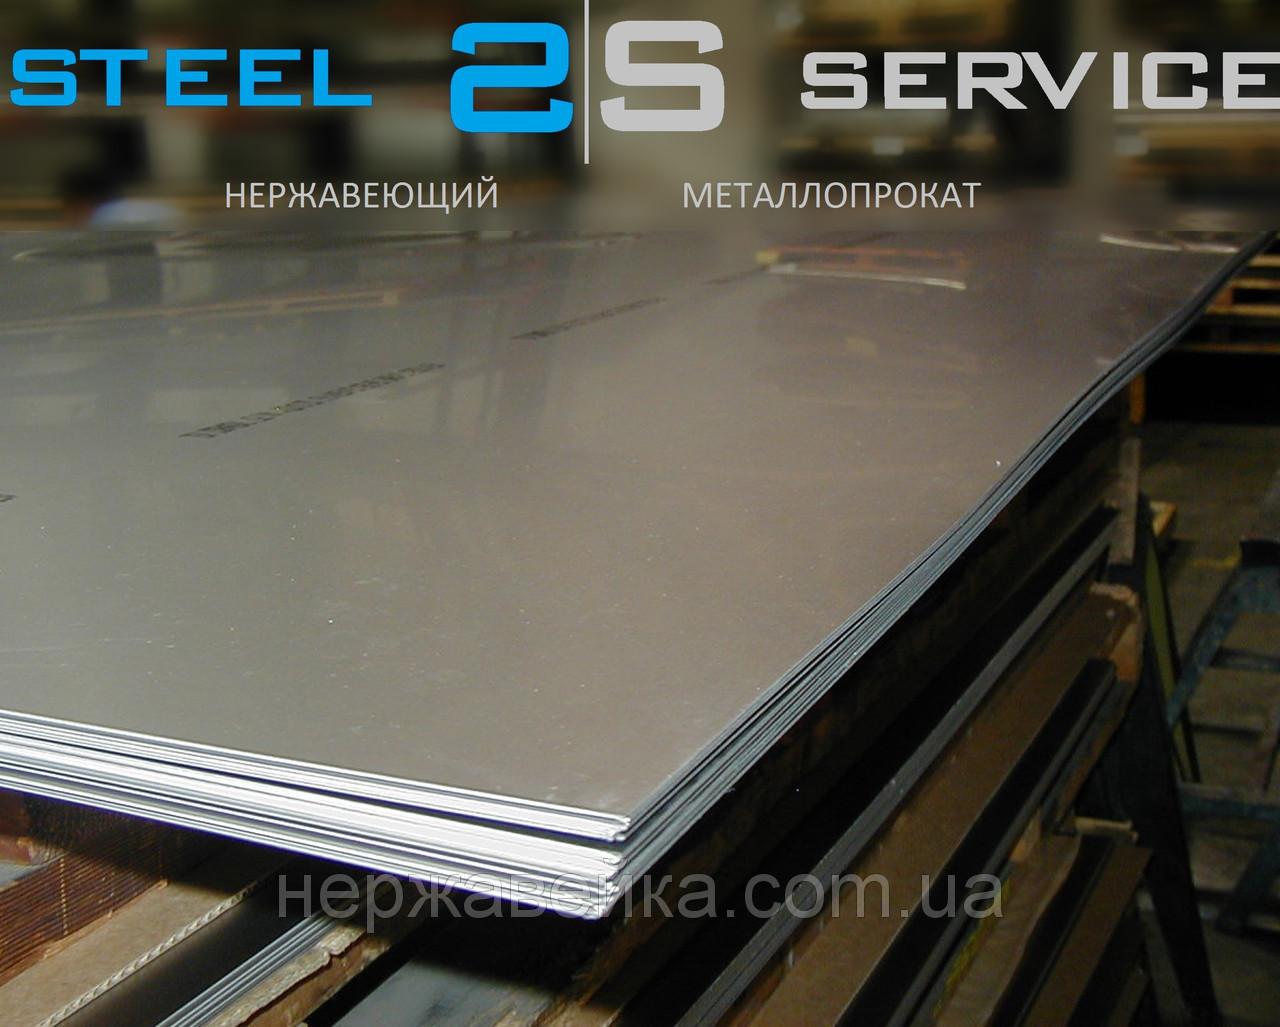 Нержавеющий лист 3х1250х2500мм  AISI 316L(03Х17Н14М3) 2B - матовый,  кислотостойкий